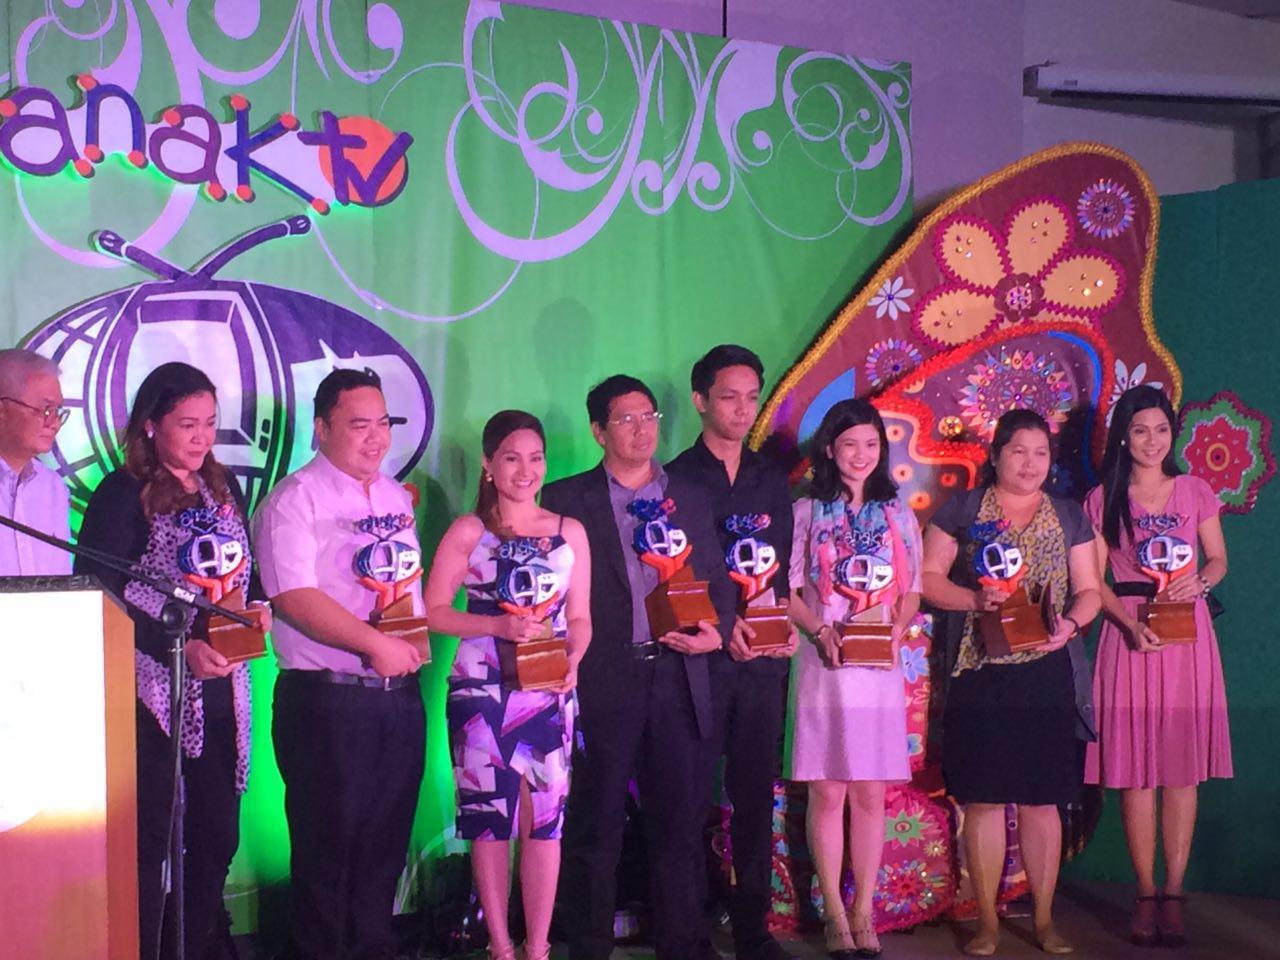 NET 25 and INC TV garner Anak TV awards